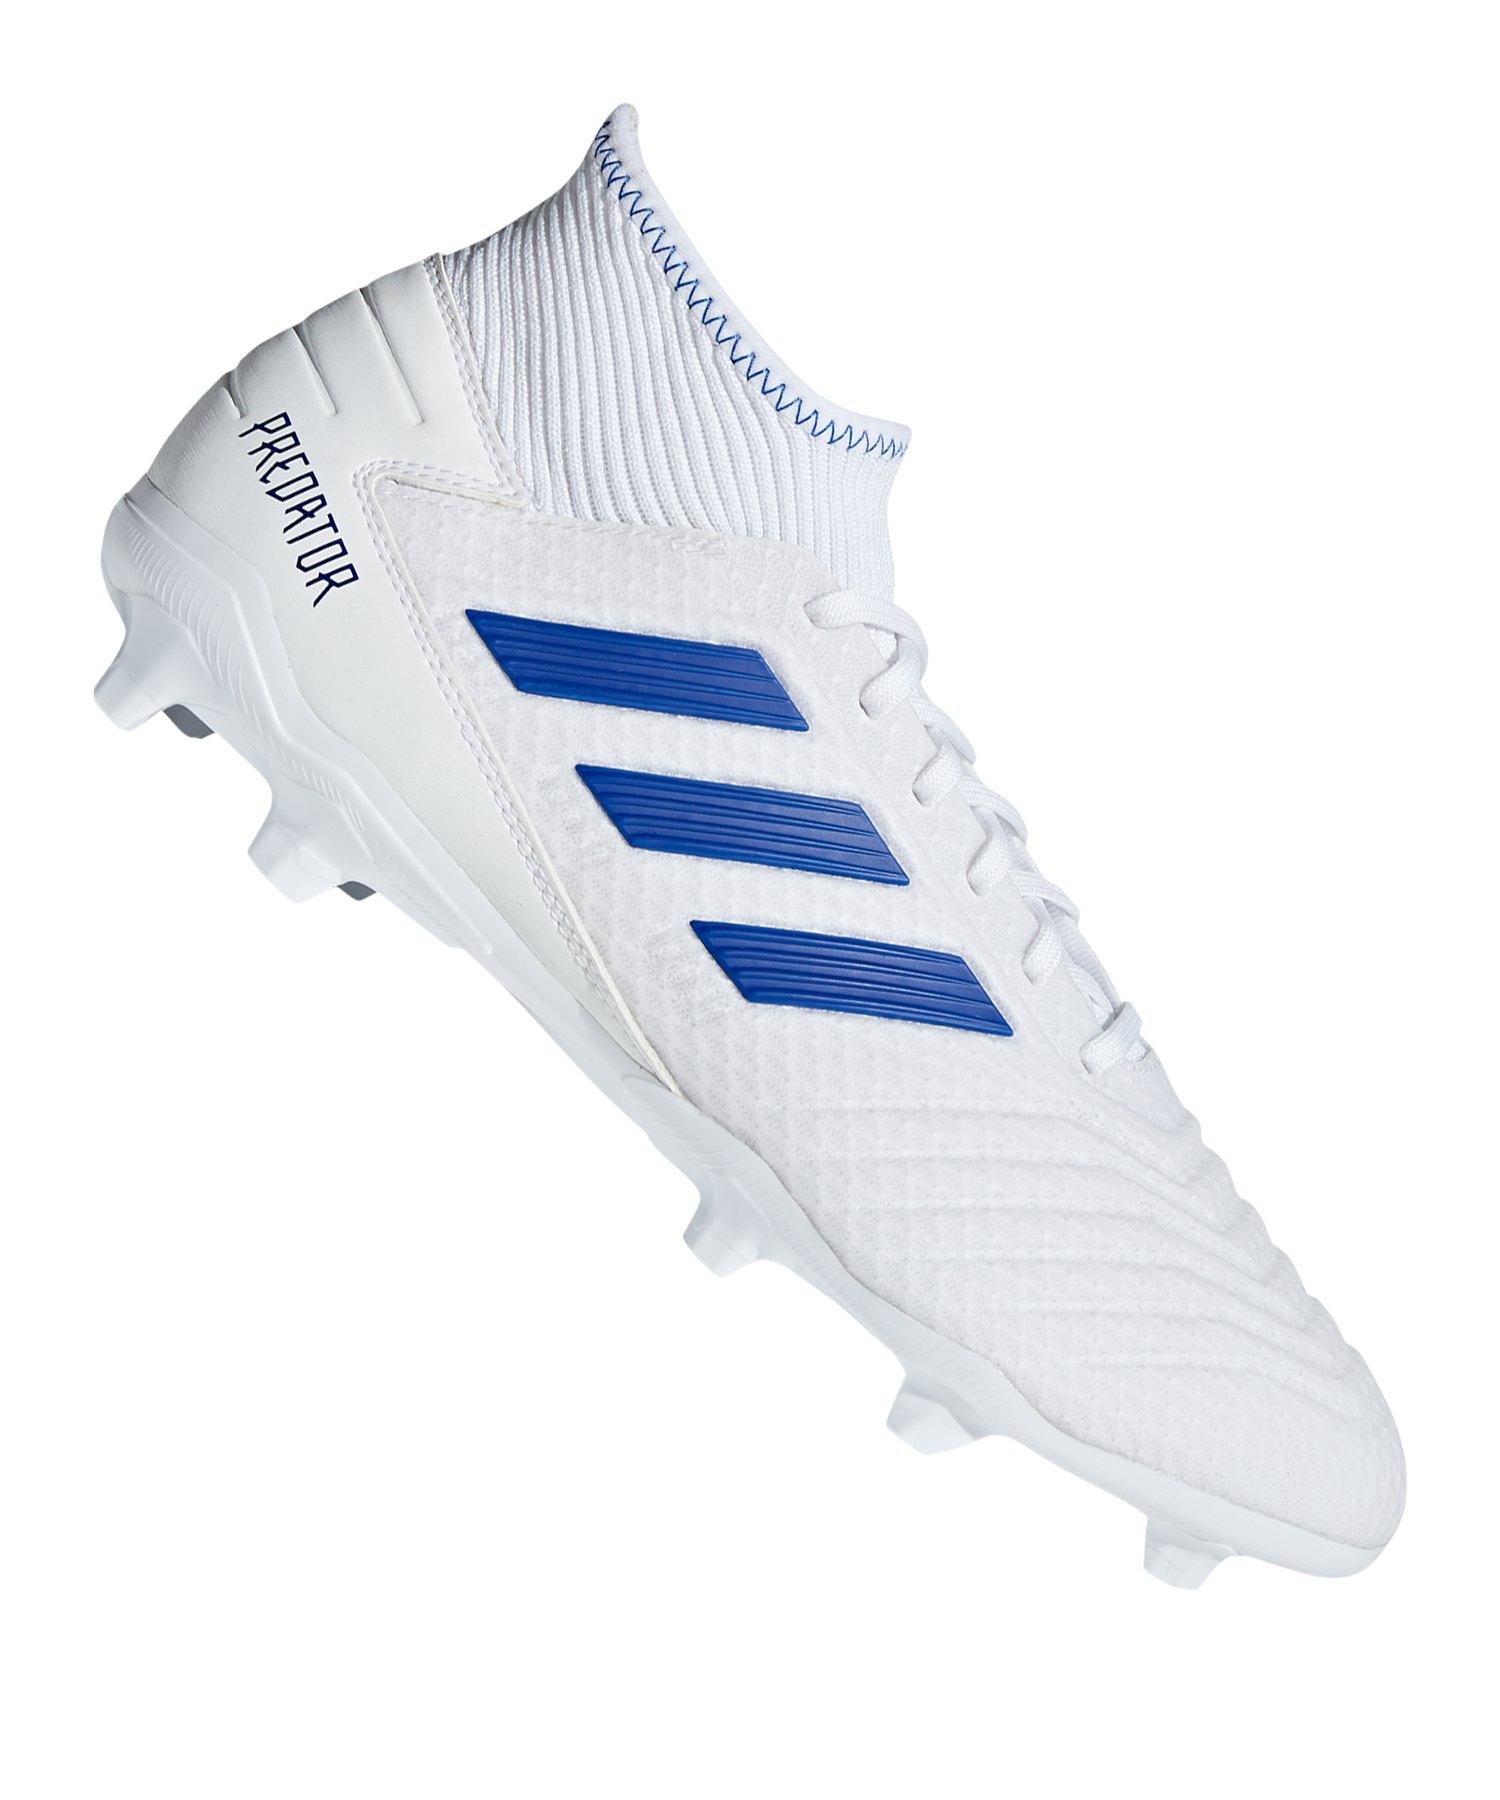 buy online 69d96 25161 adidas Predator 19.3 FG Weiss Blau - weiss